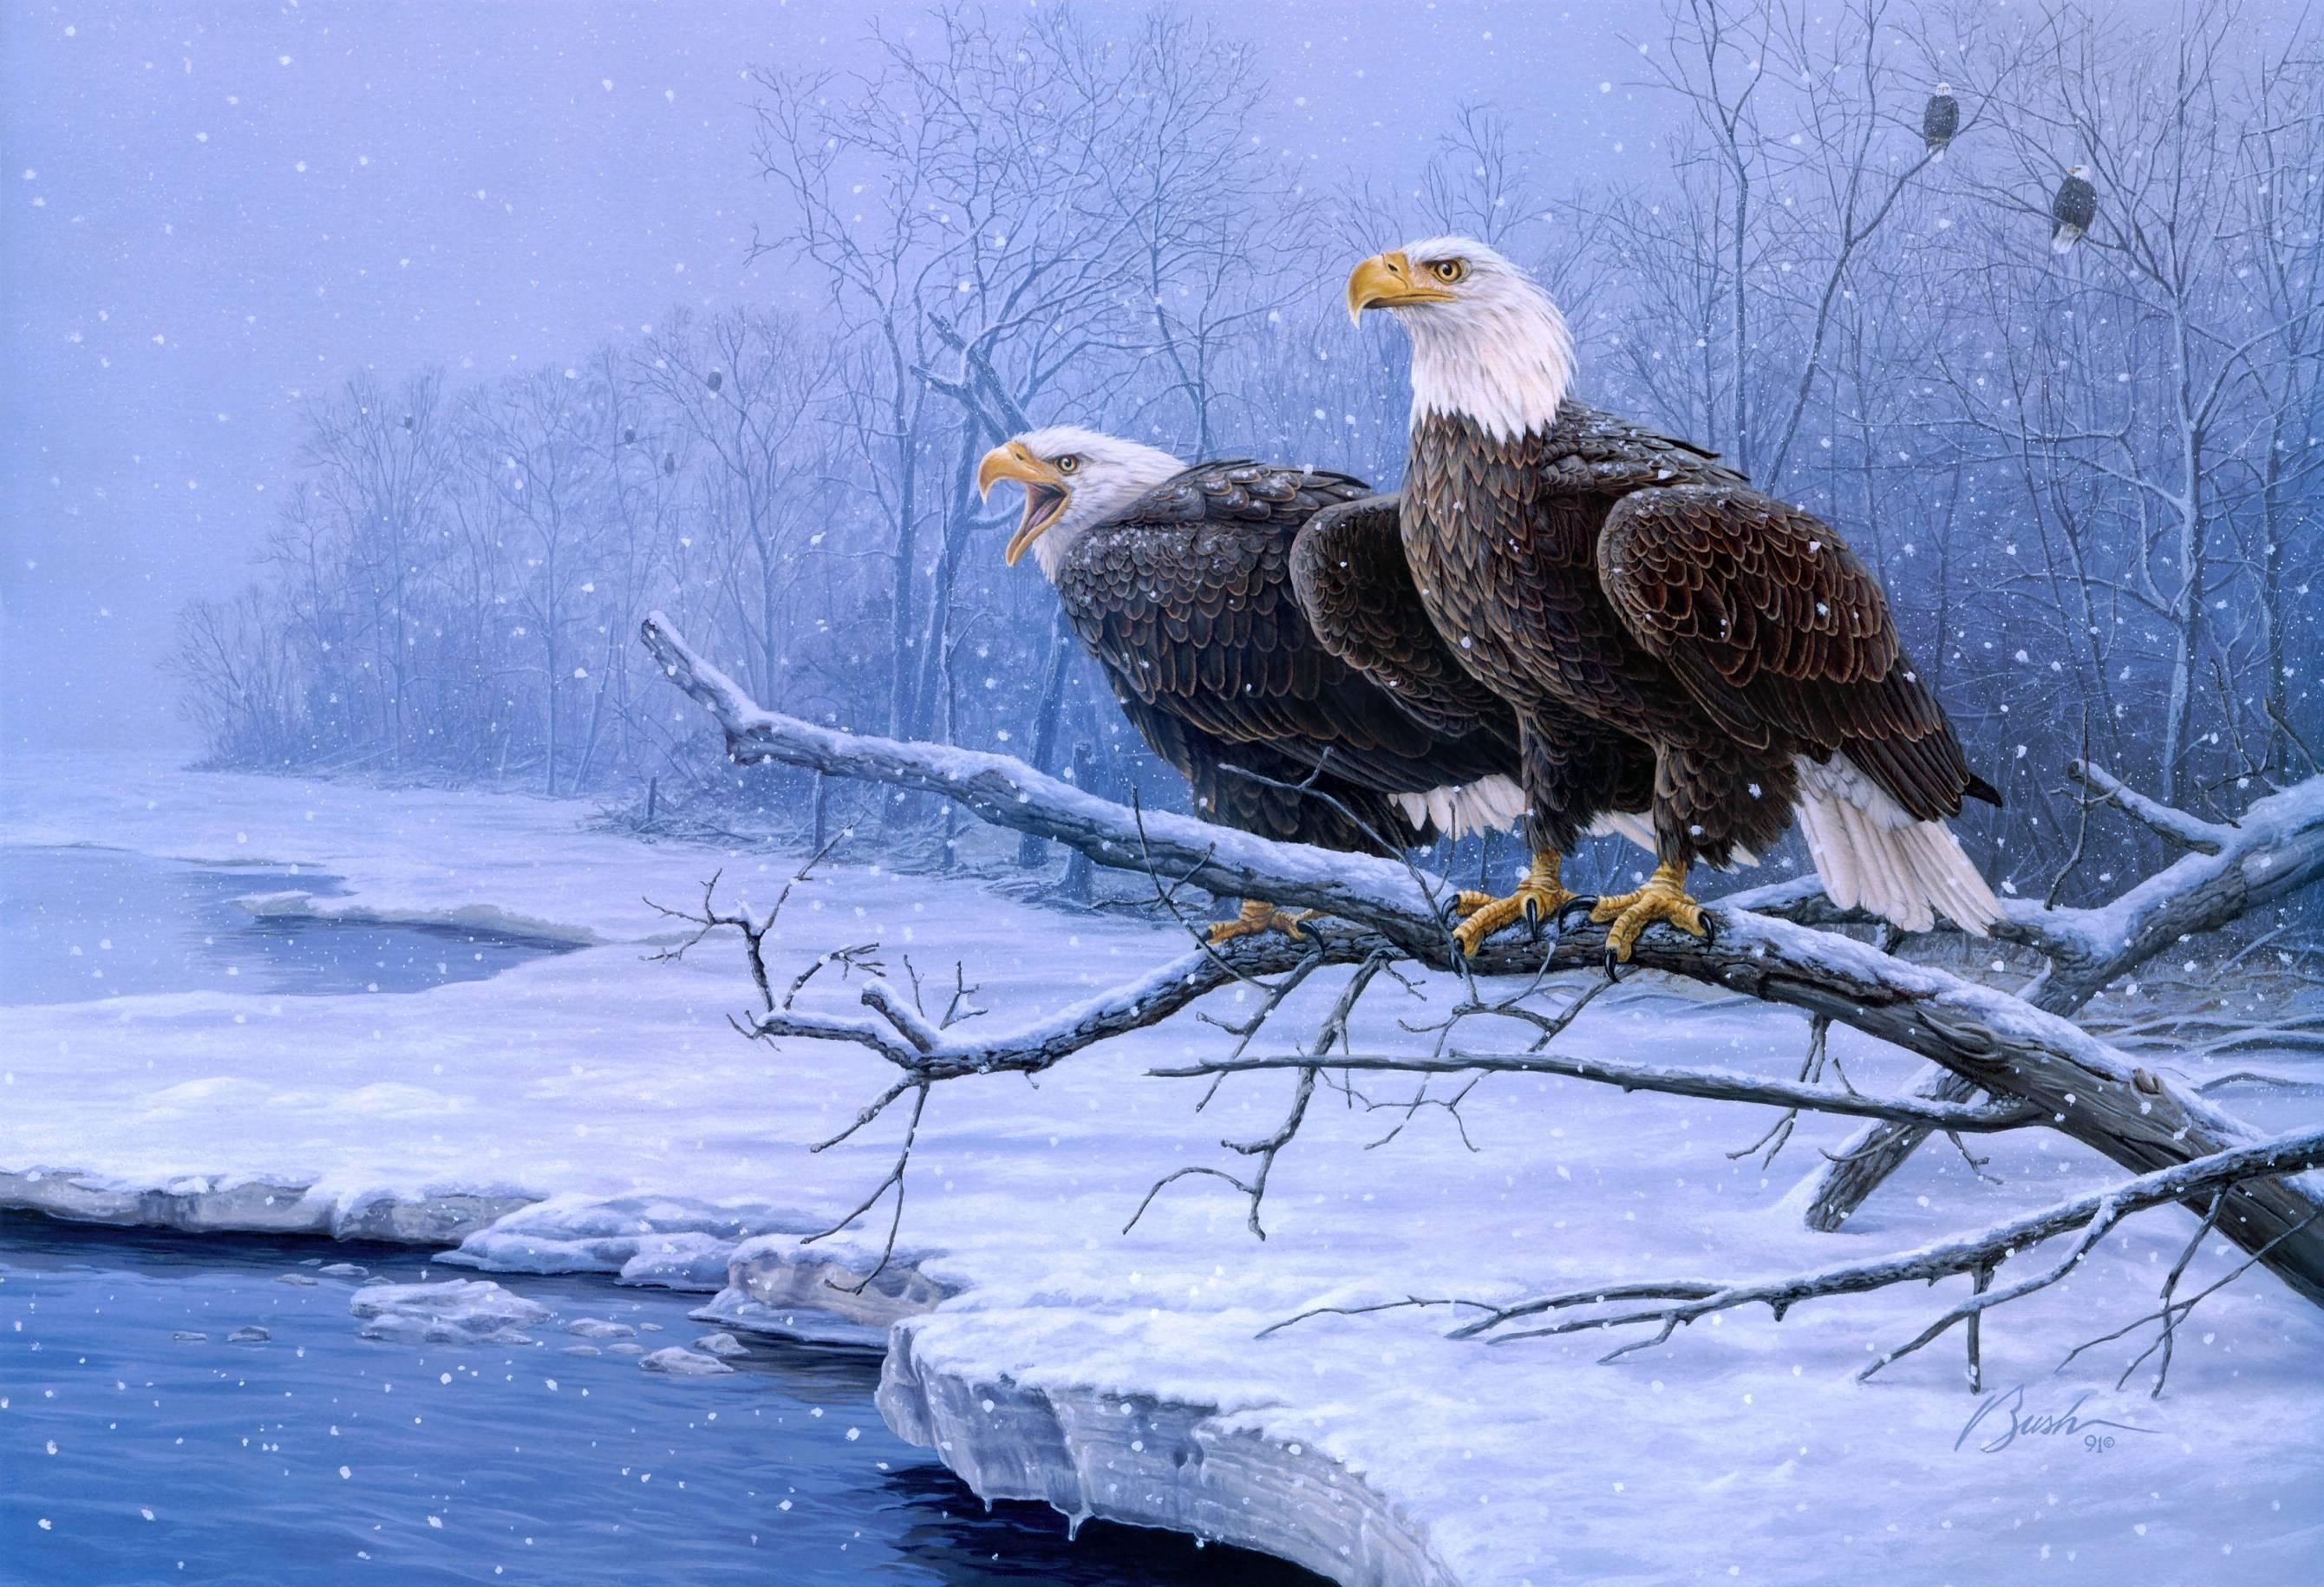 Bald Eagle Wallpapers - Wallpaper Cave